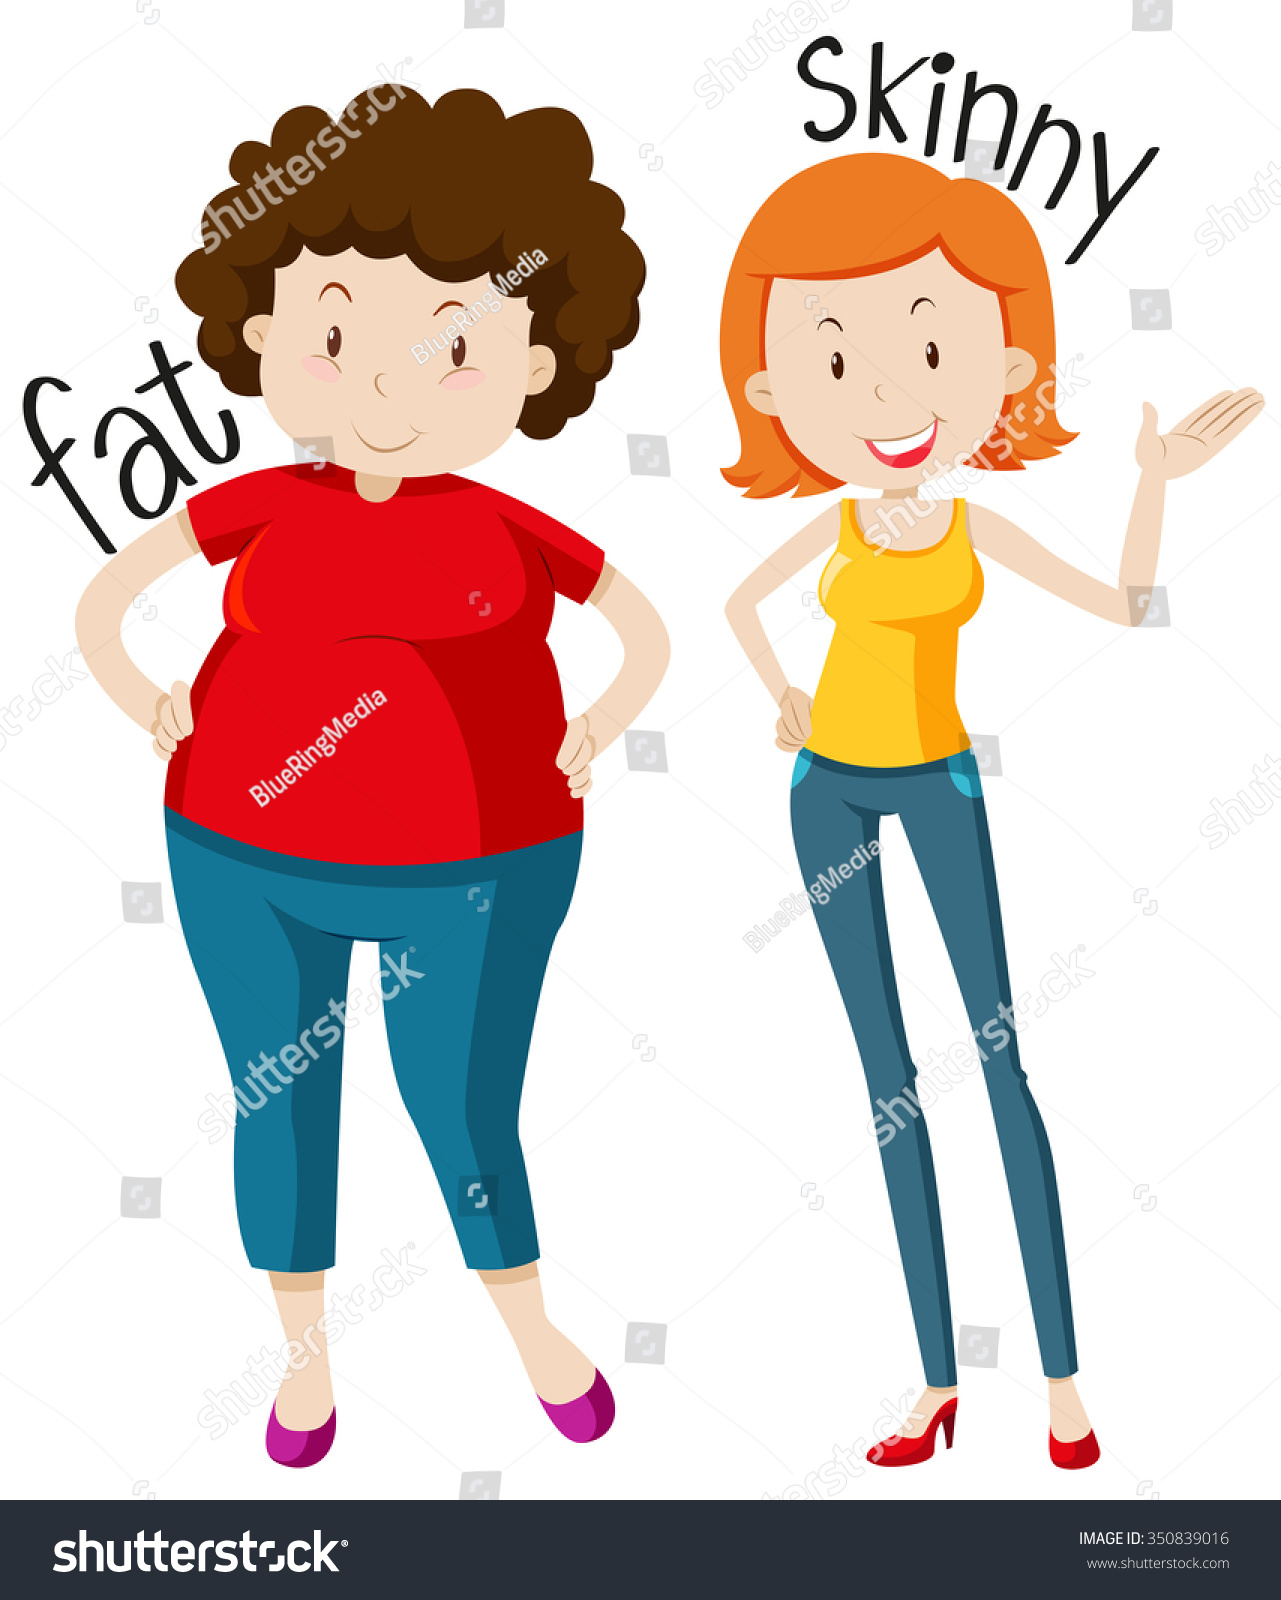 Opposite Adjectives Fat Skinny Illustration Stock Vector